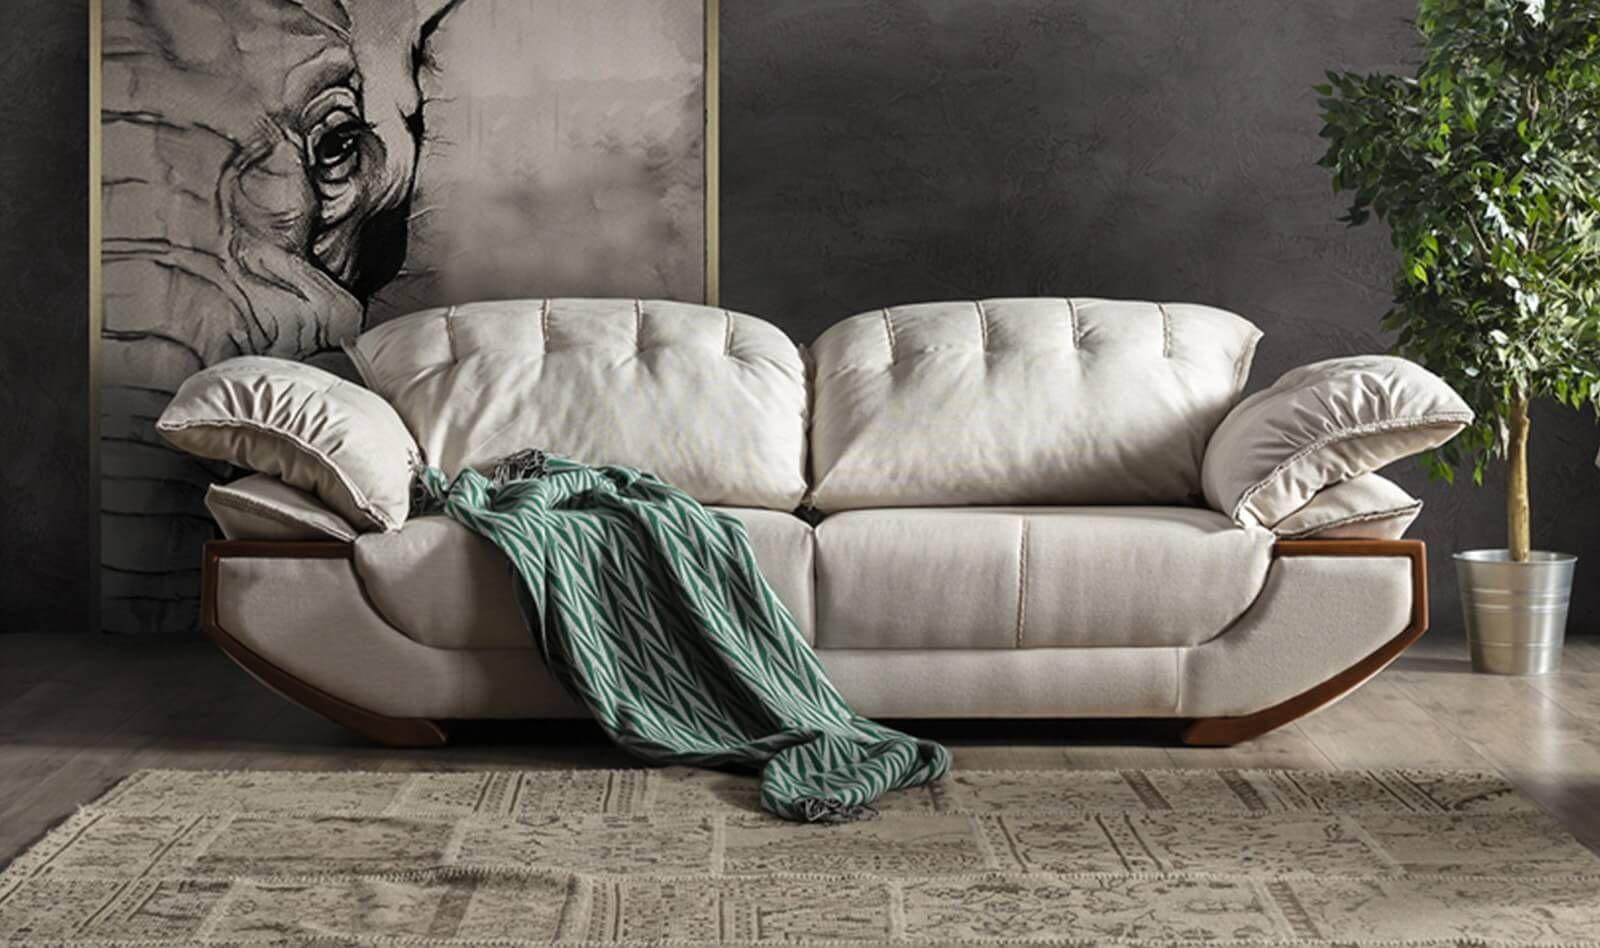 Relax Comfort Uclu Koltuk 01 Medusa Home Mobilya Fikirleri Oturma Odasi Tasarimlari Mobilya